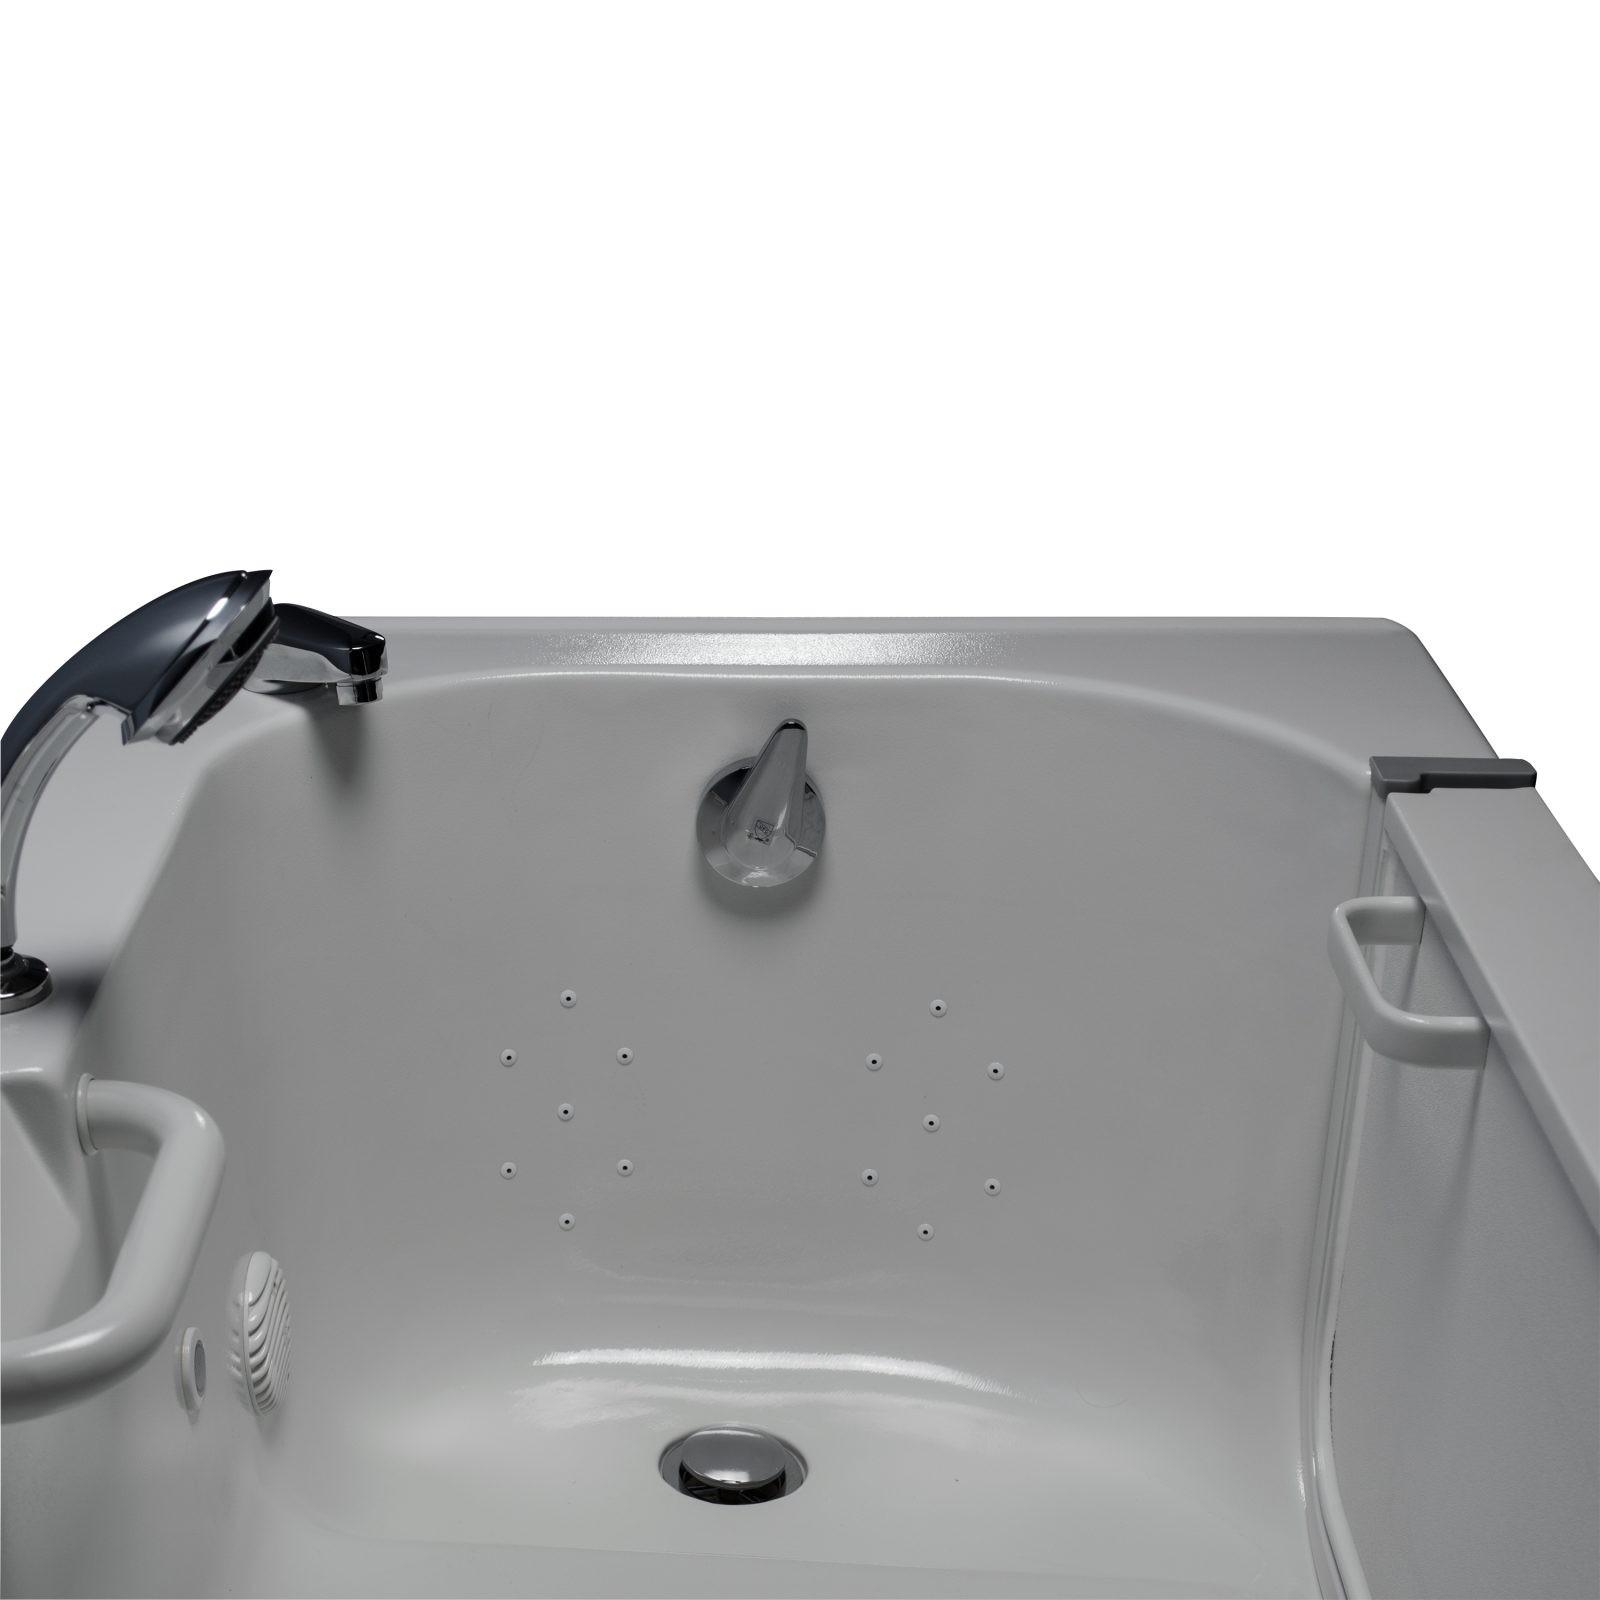 Neptune Series Sitin Tubs  Buy Now at Homeward Bath